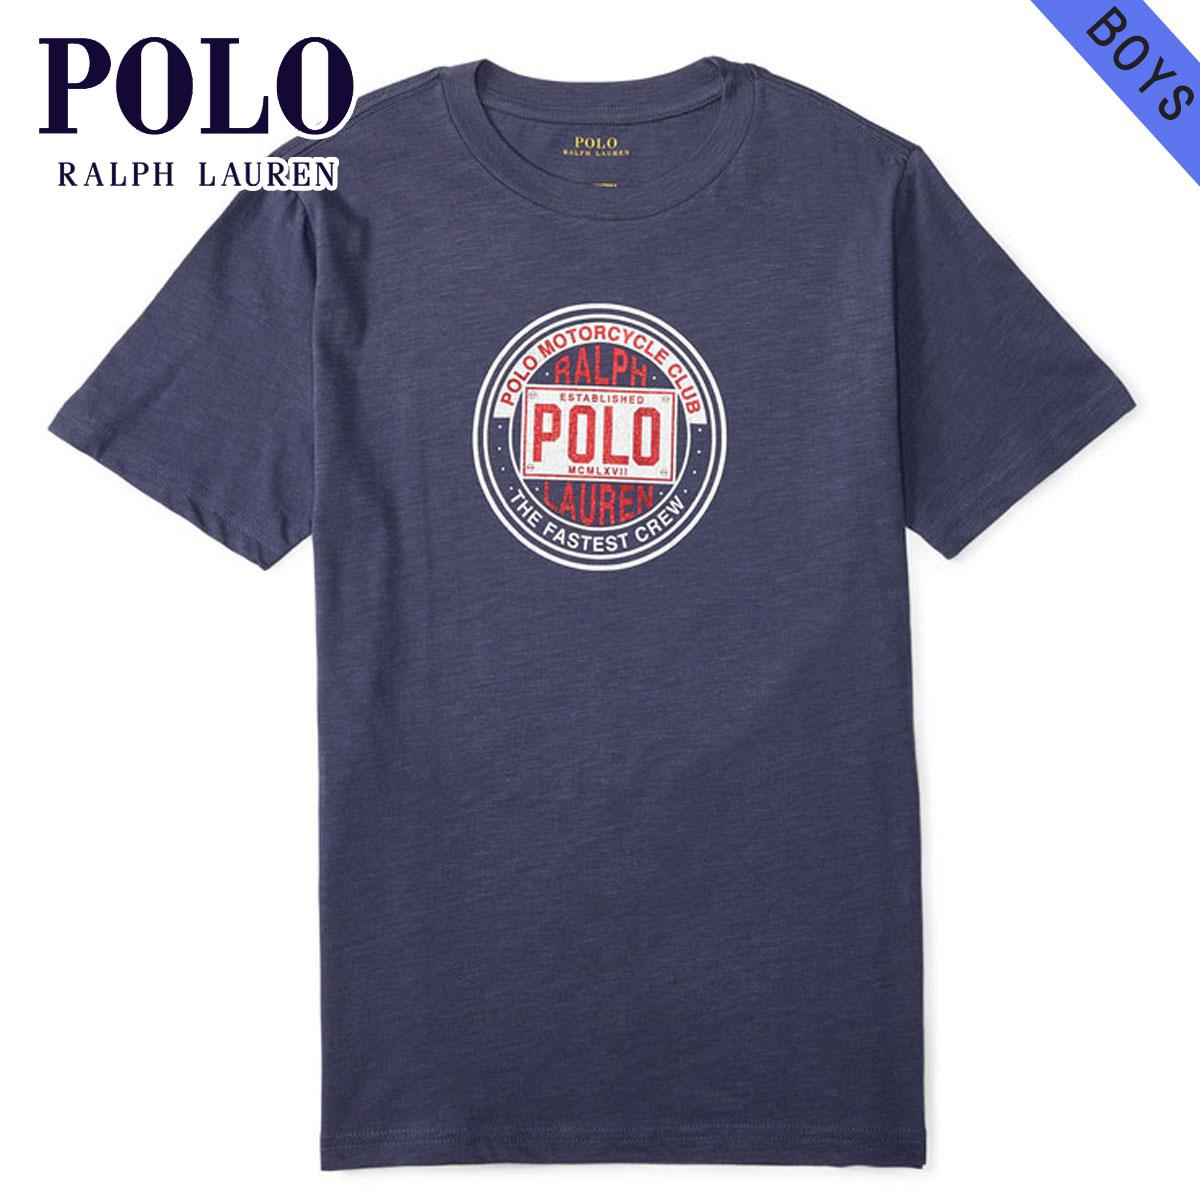 Children Slub Cotton Short Graphic Clothes Lauren Ralph Children's T Polo Shirt Regular Article Jersey Tee Kids Sleeves Yf76yvbg